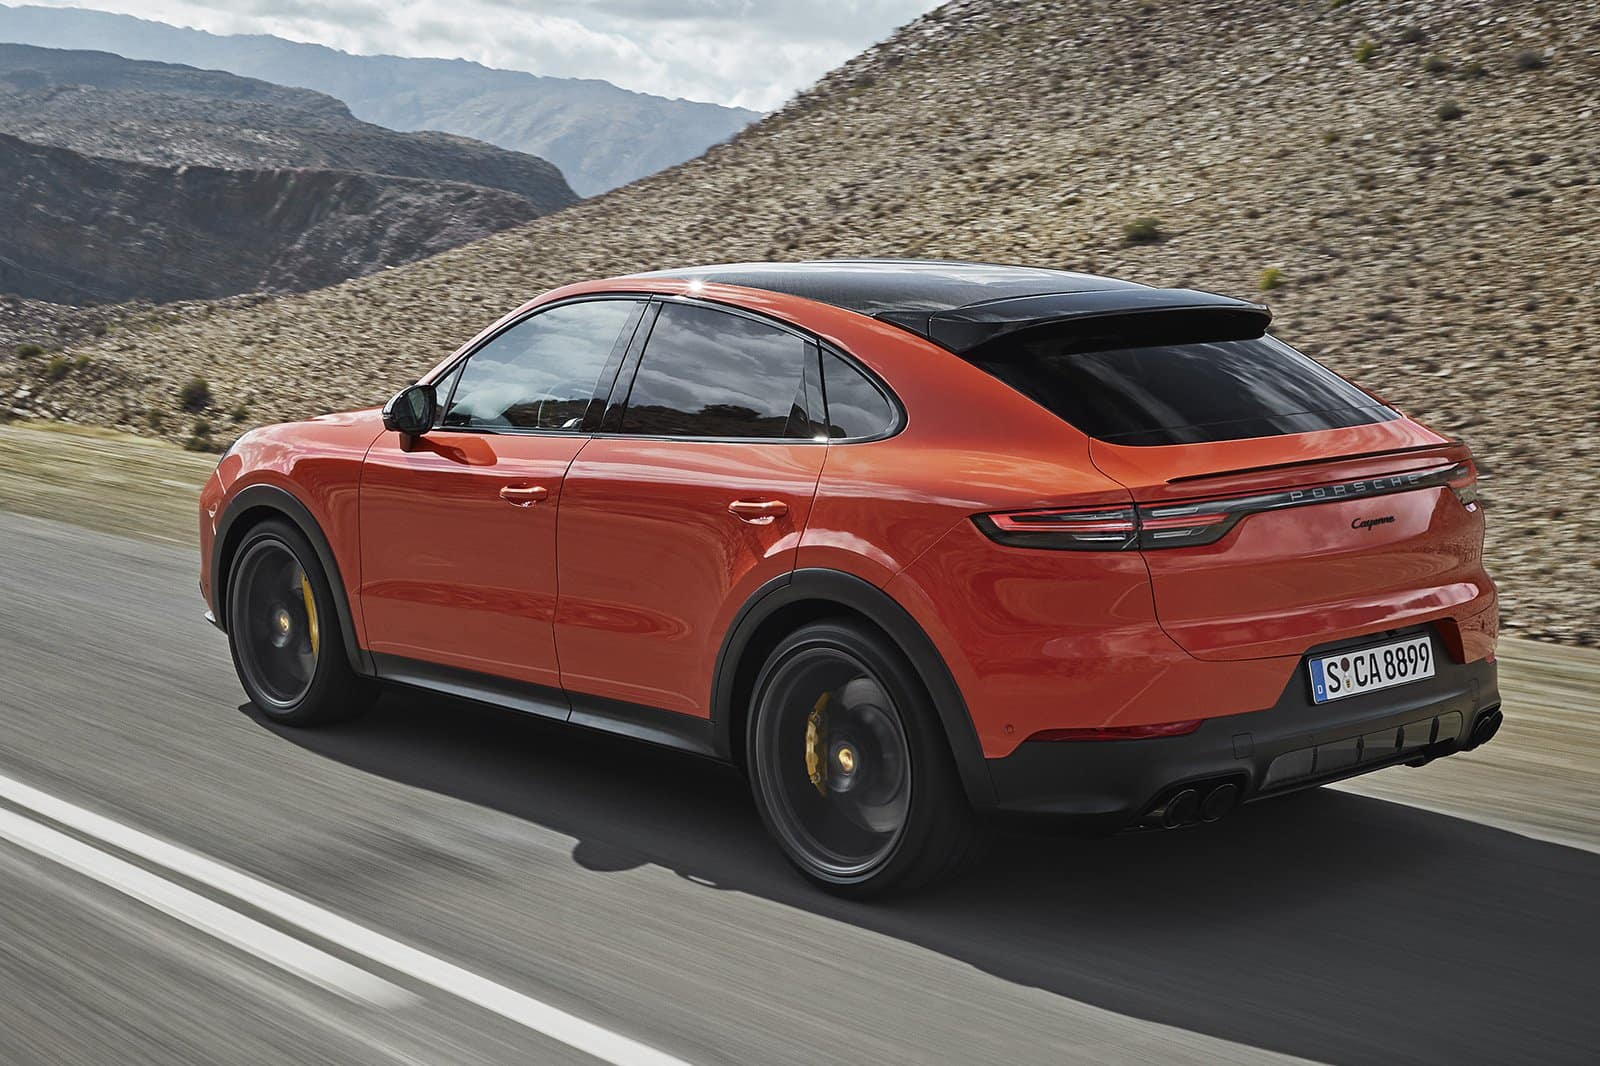 2019 Porsche Macan Vs 2019 Porsche Cayenne